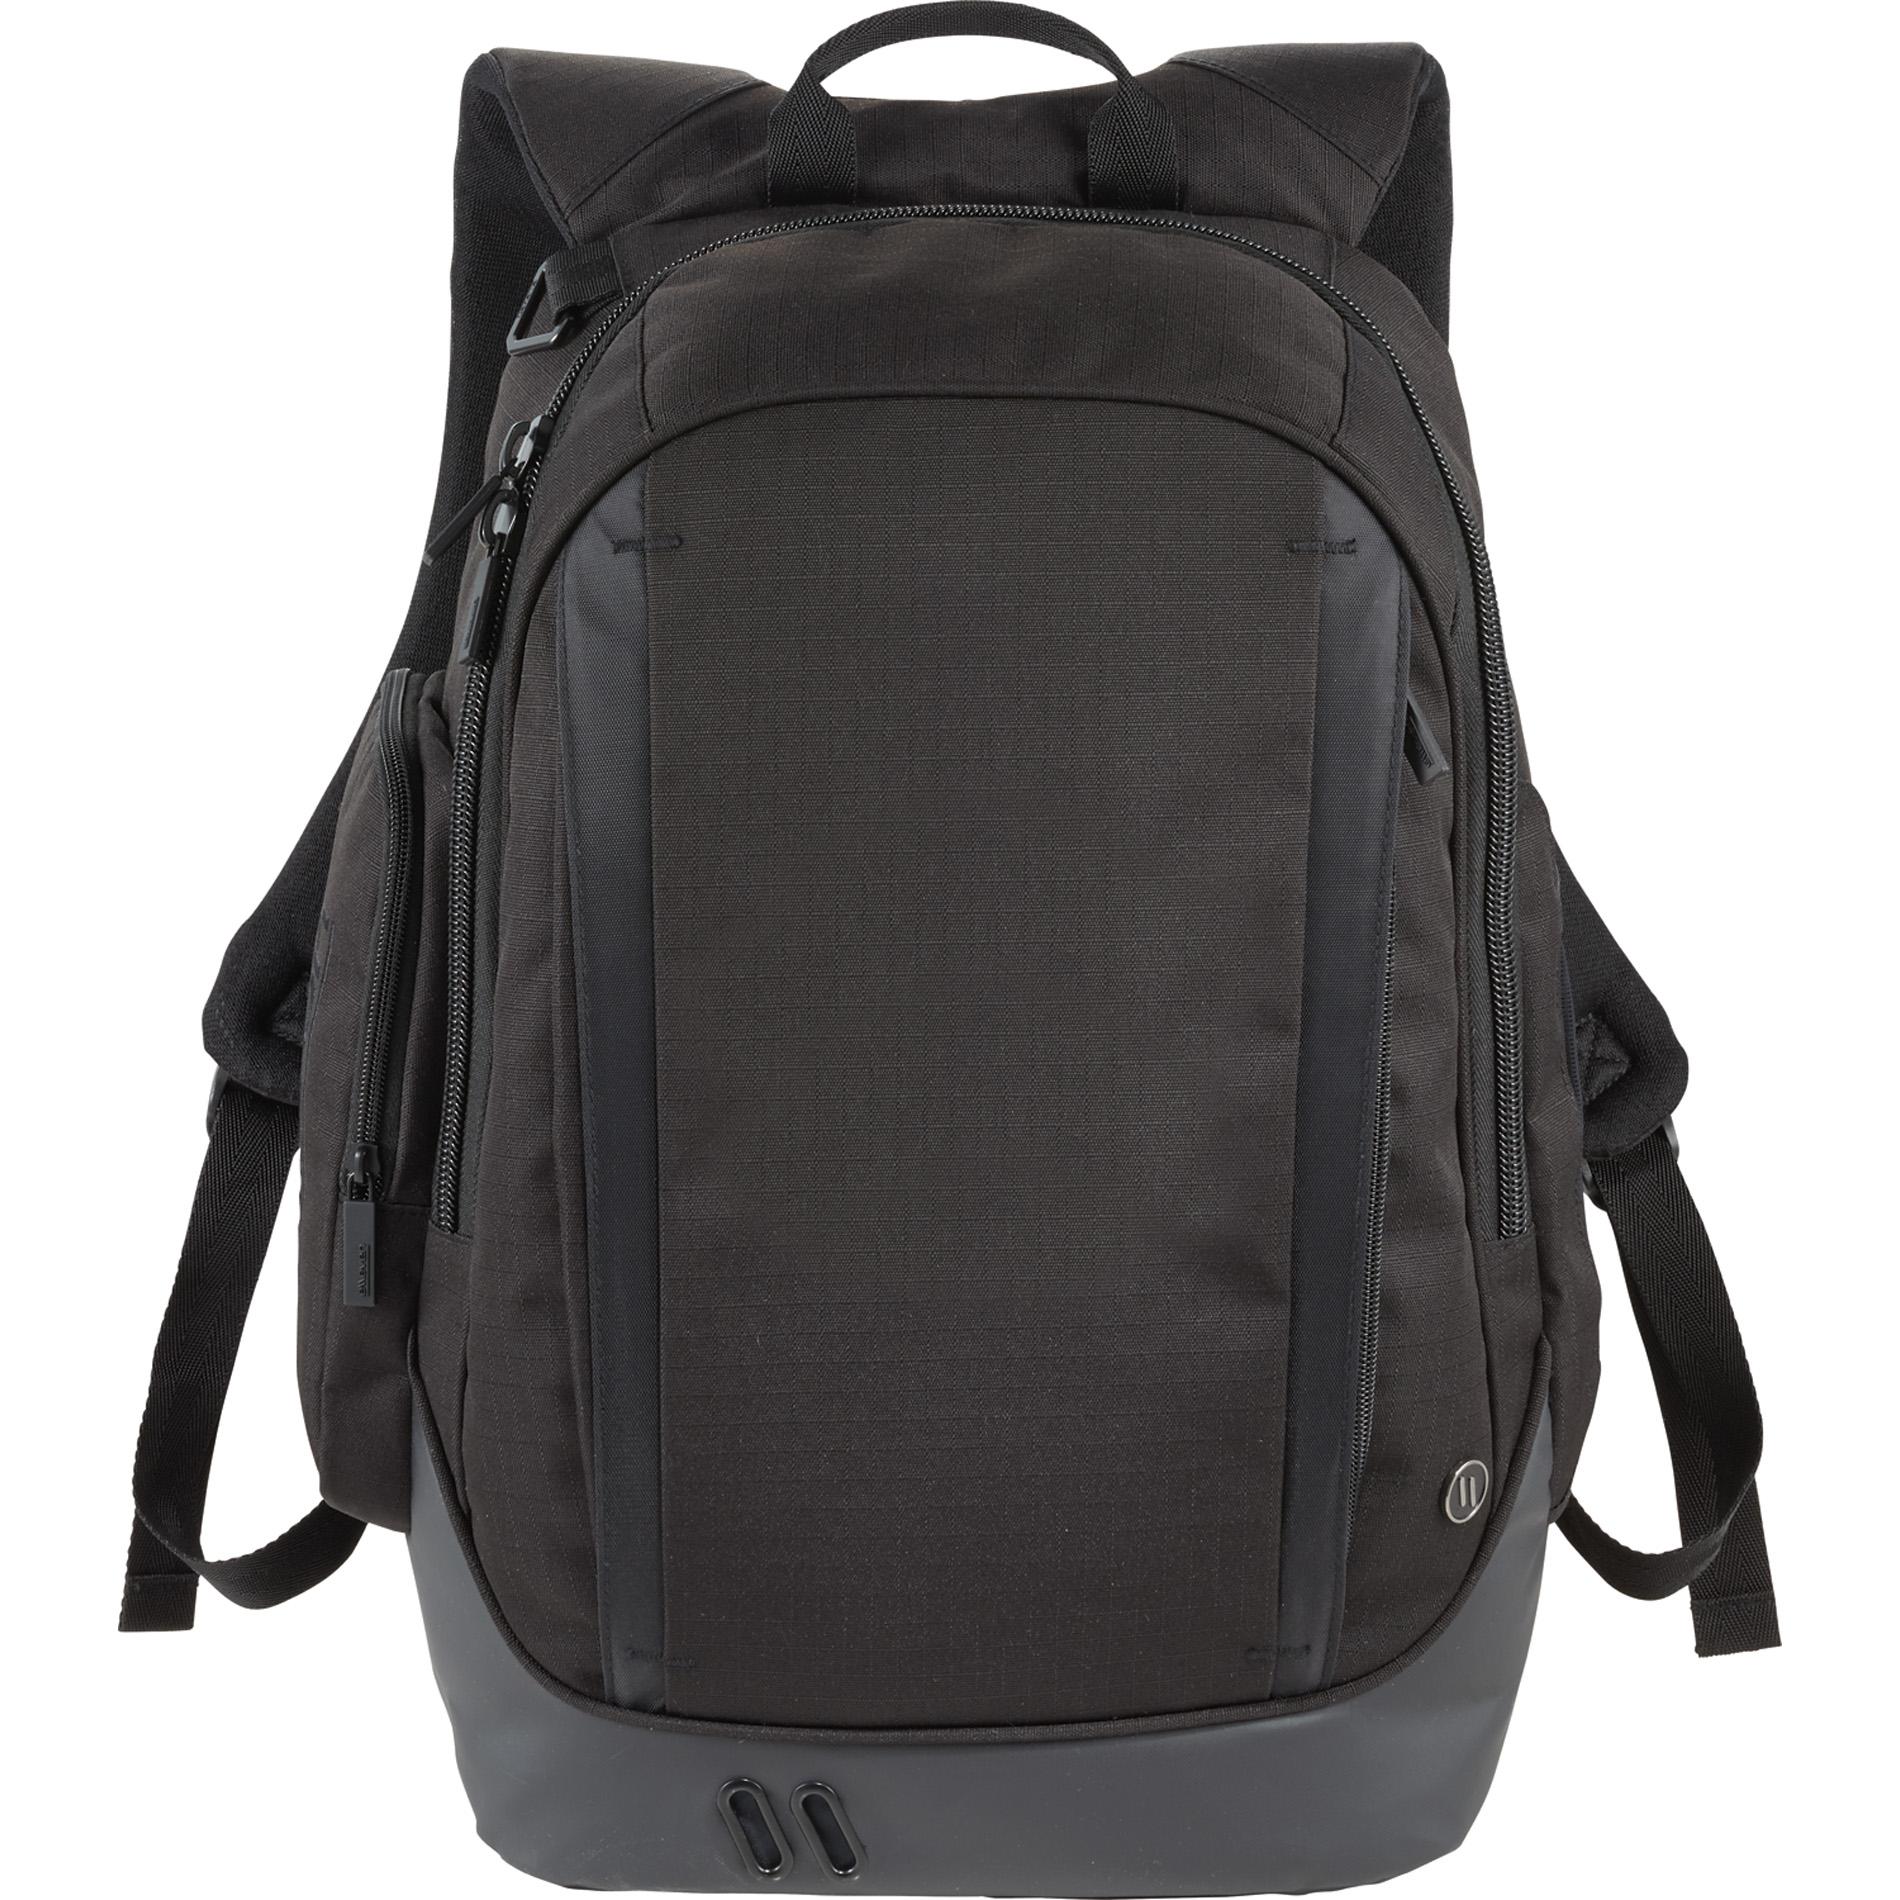 "elleven 0011-65 - Modular 15"" Computer Backpack"